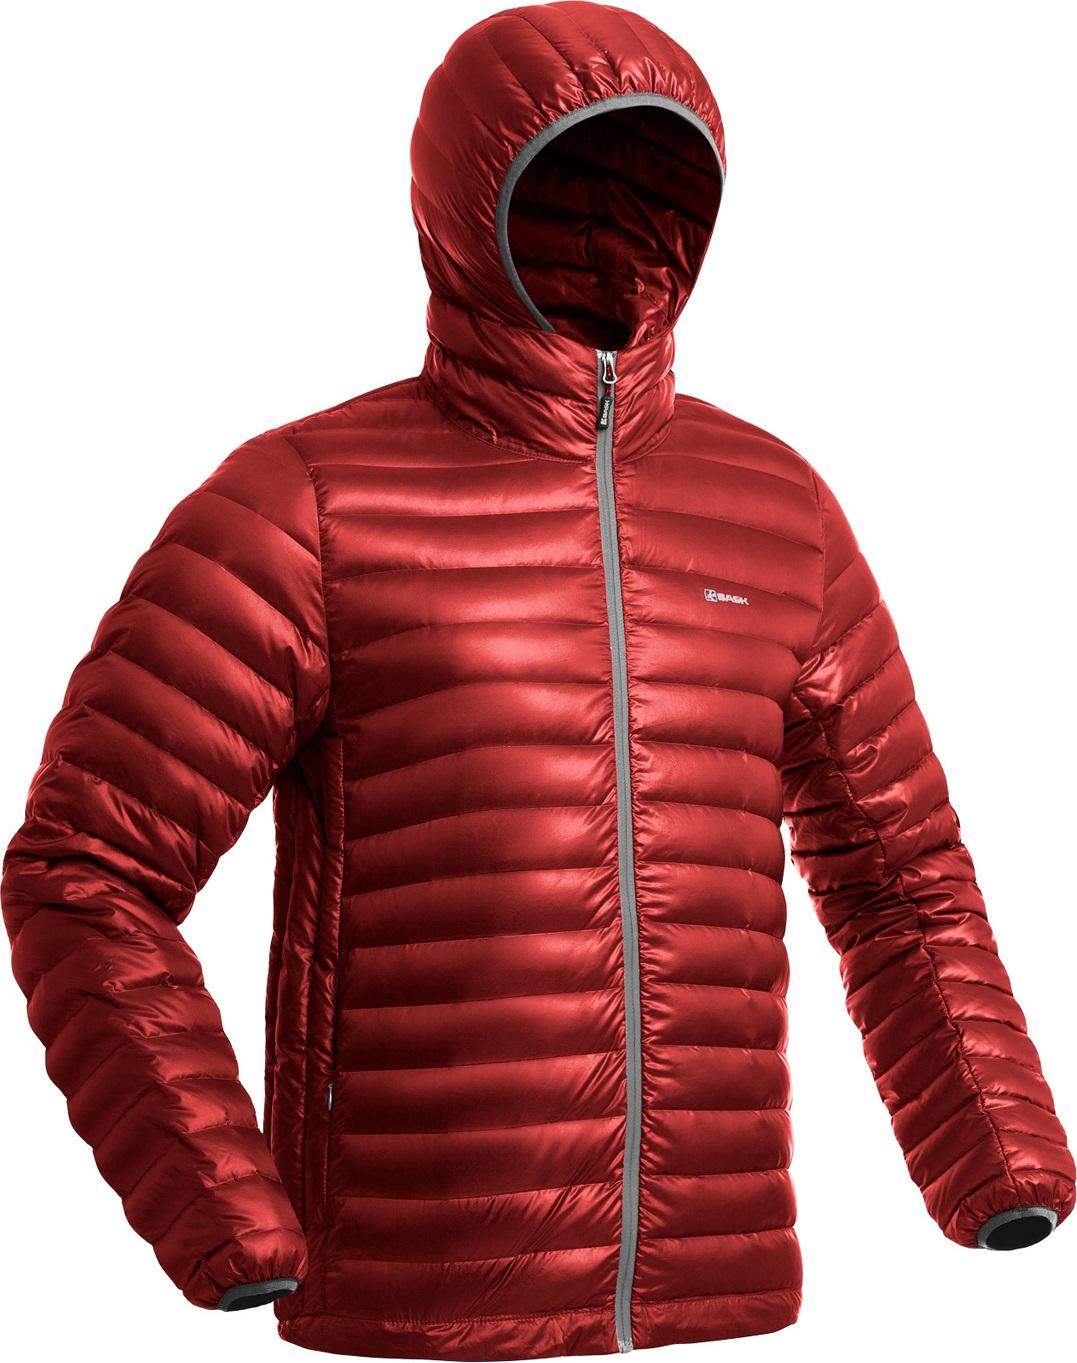 Куртка пуховая BASK CHAMONIX LIGHT MJ красная, Куртки - арт. 1149350156